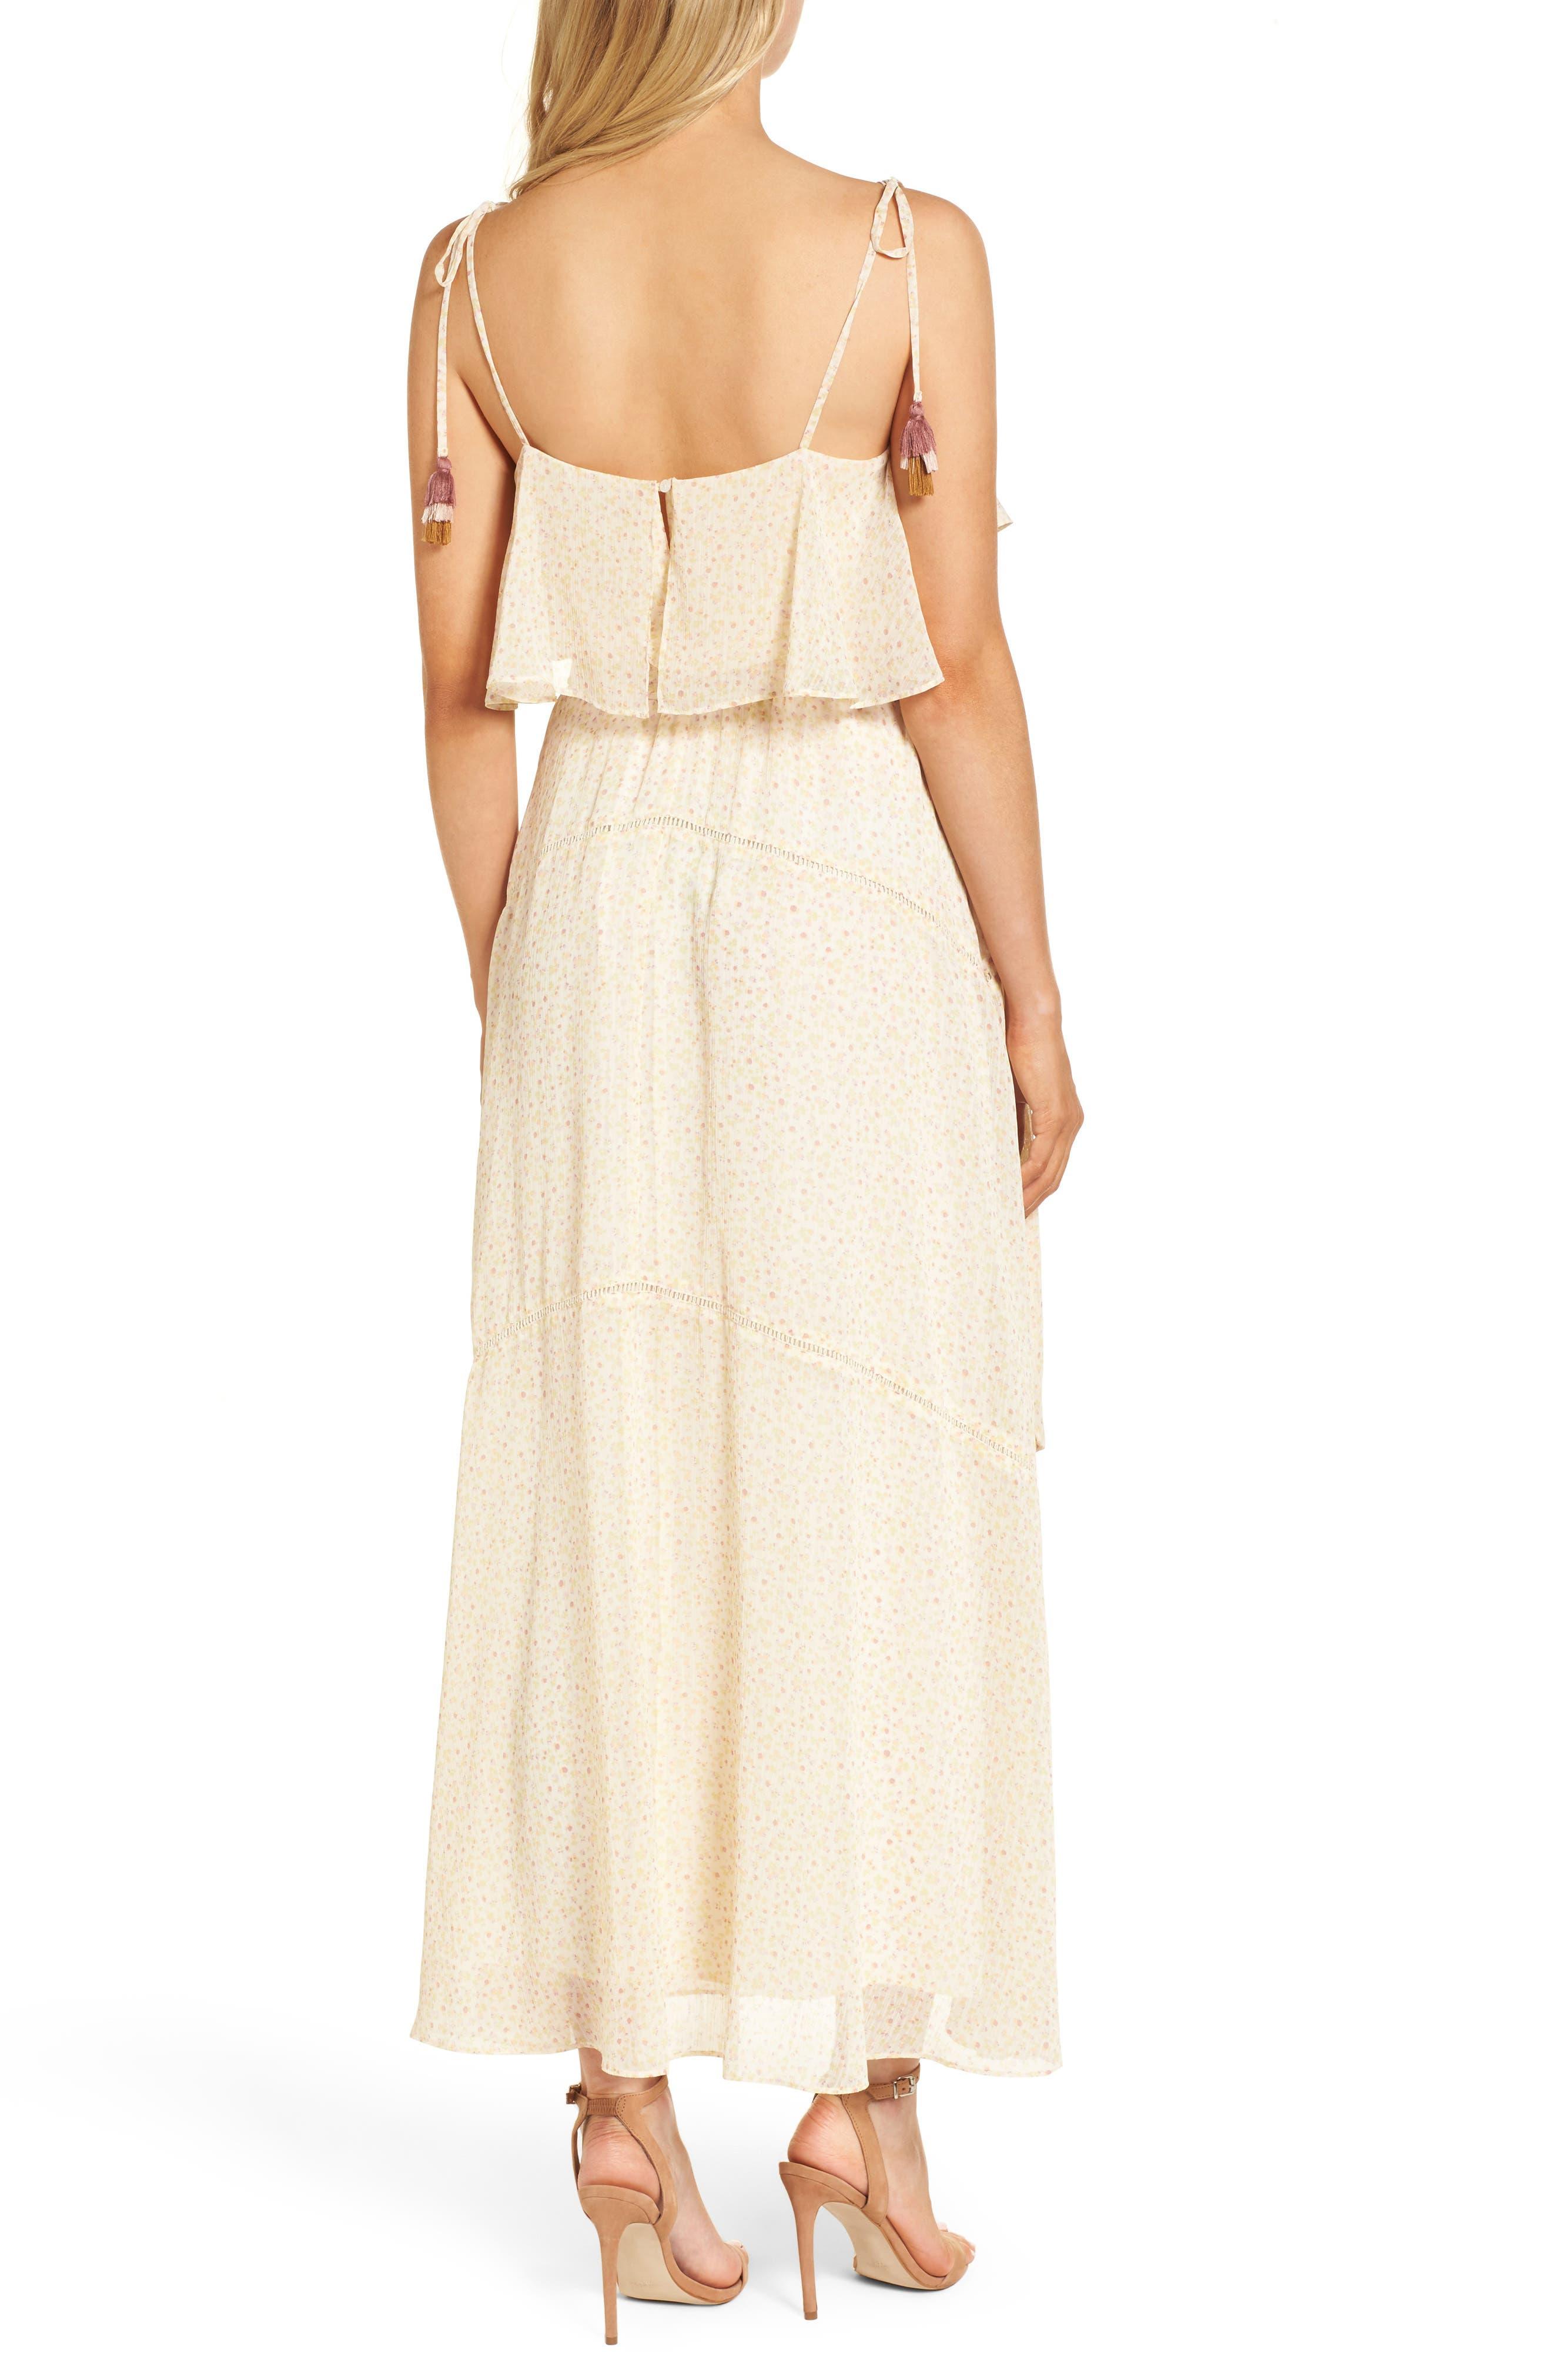 Decklan Maxi Dress,                             Alternate thumbnail 2, color,                             900